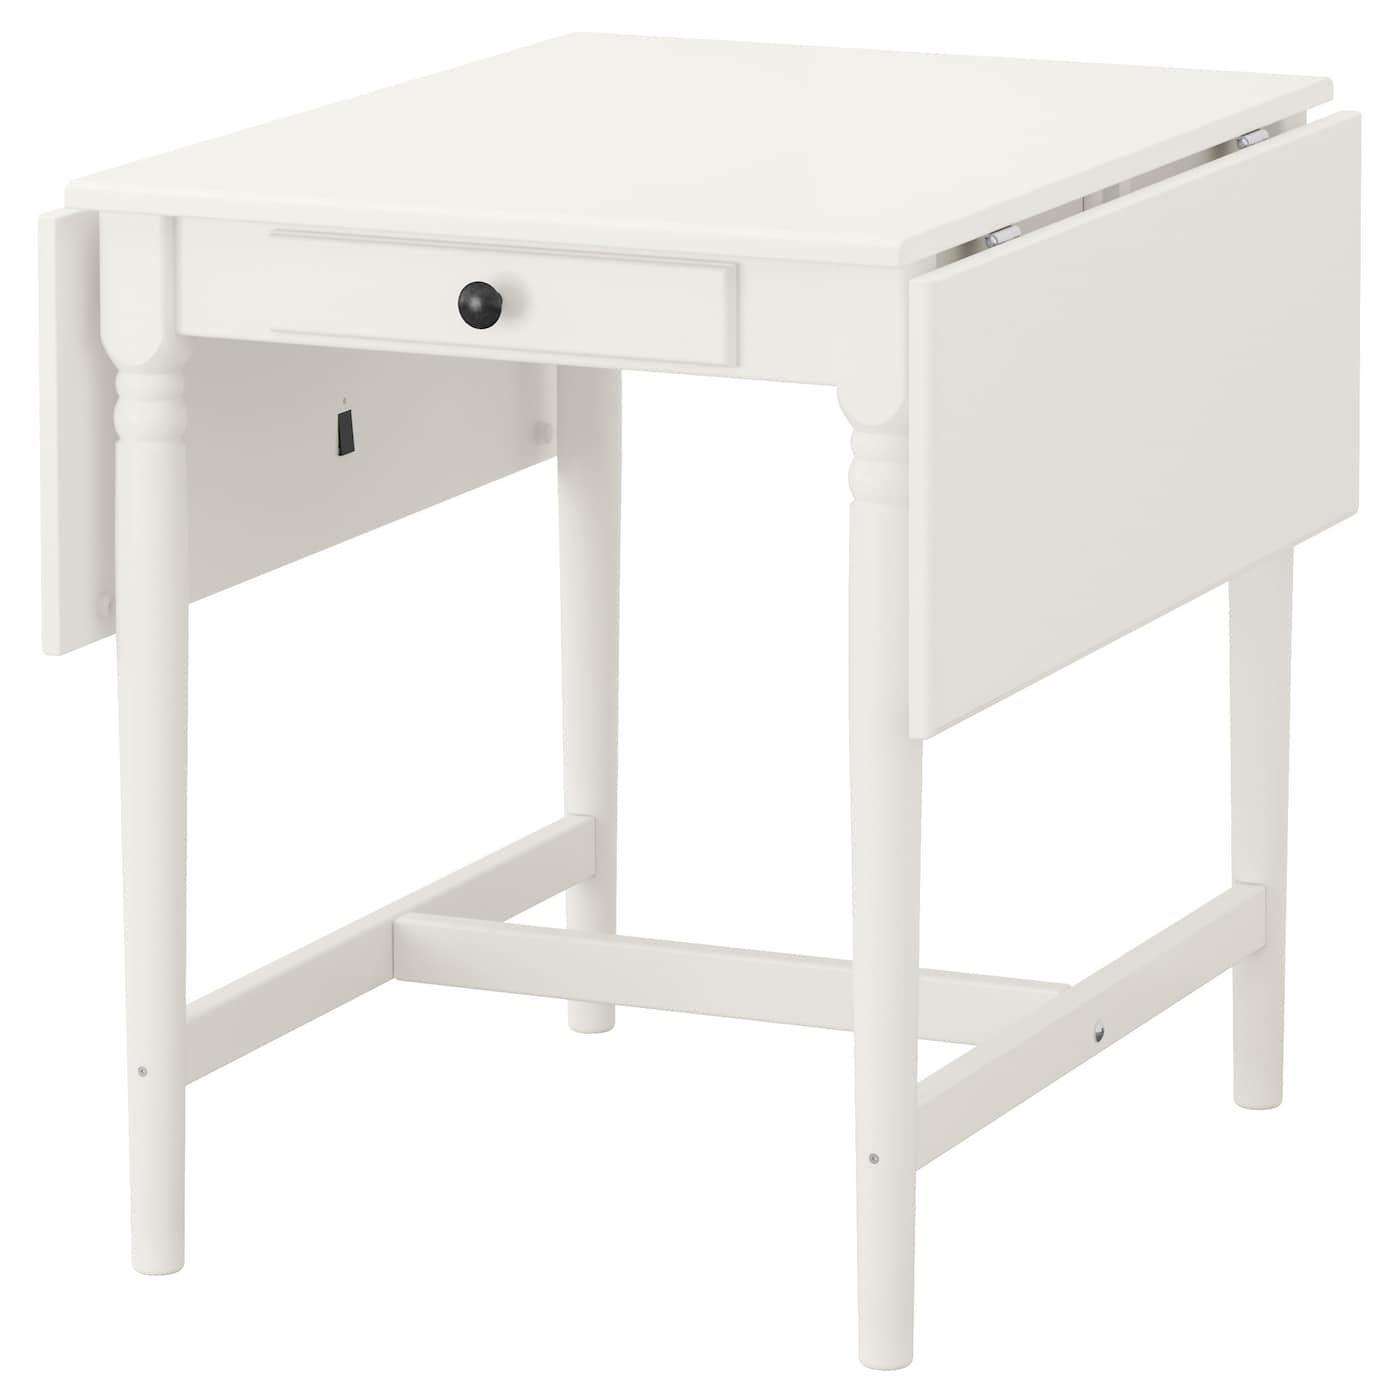 Ingatorp Drop Leaf Table White 25 5 8 48 3 8x30 3 4 Vitt Matbord Litet Matbord Matbord